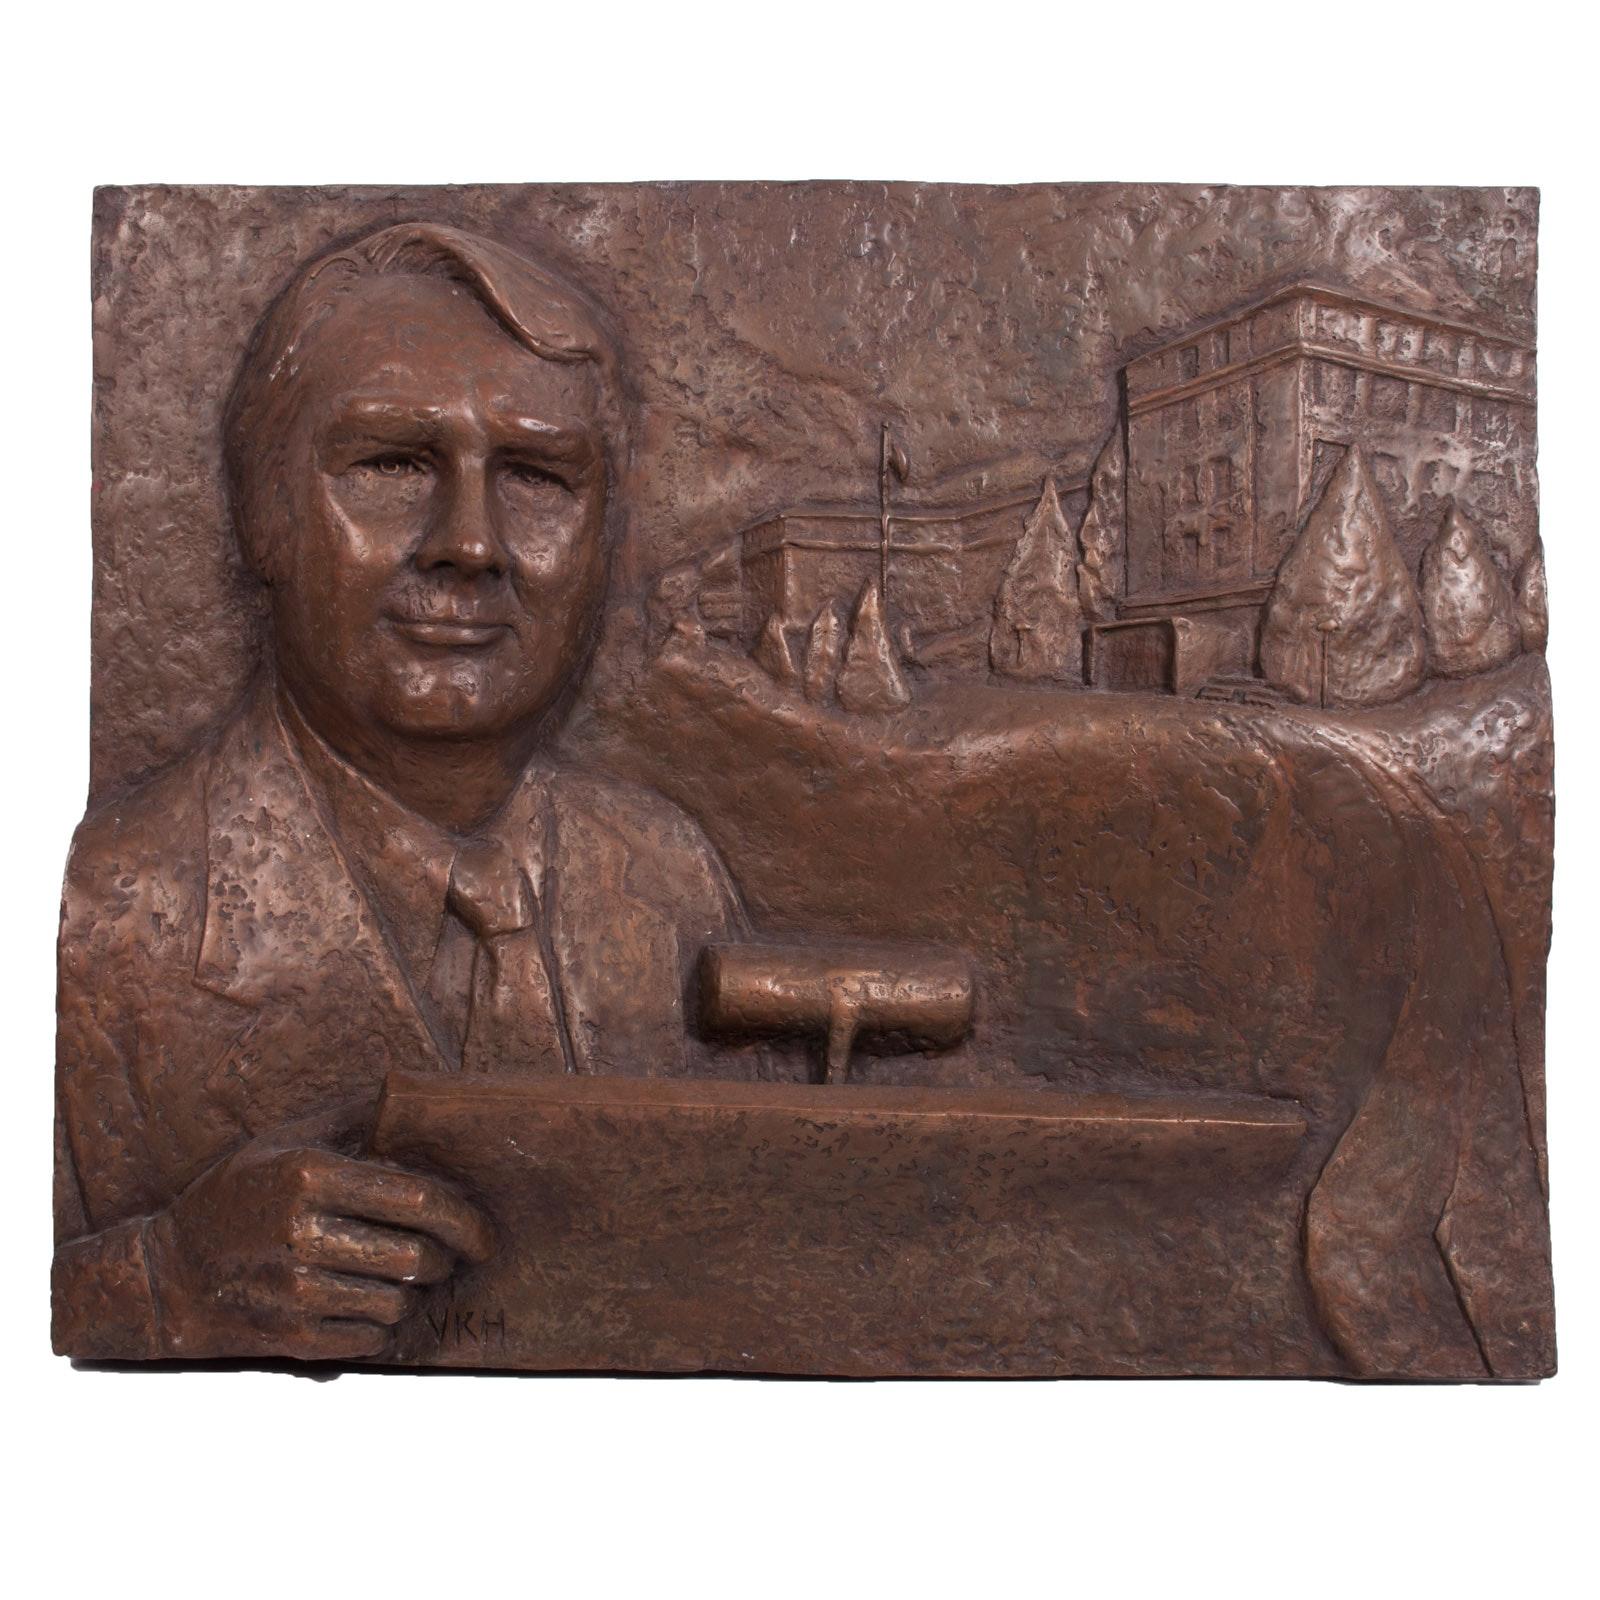 Virginia K. Hess Cold Bronze Maquette Sculpture of Dr. Donald Brinkmann